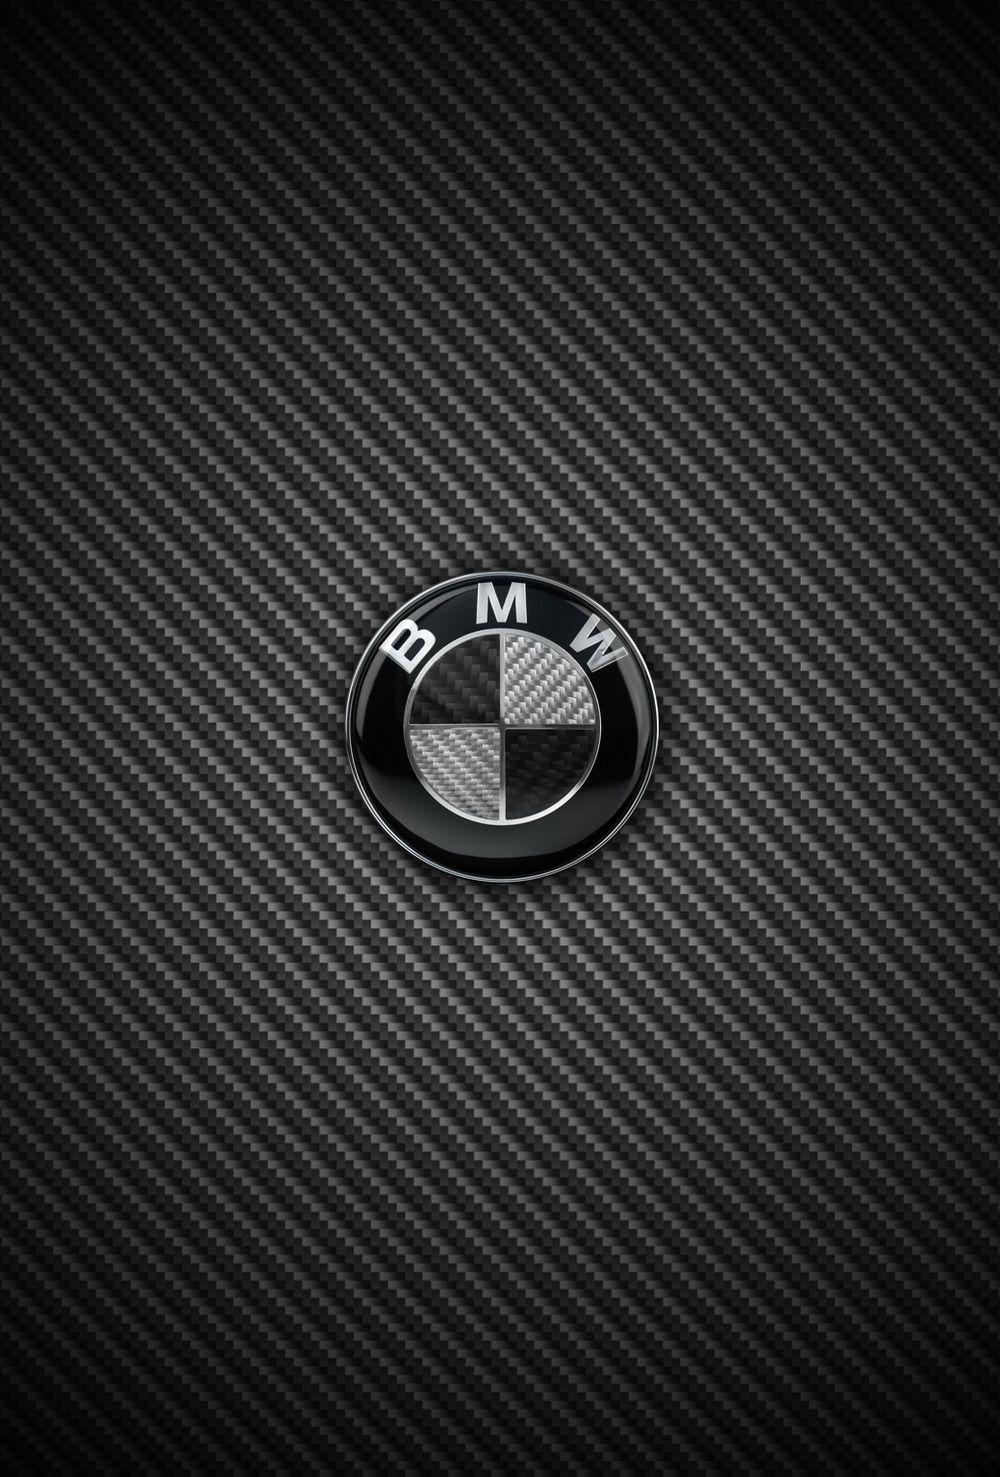 iphone bmw wallpaper | hobby stuff | pinterest | bmw, luxury cars